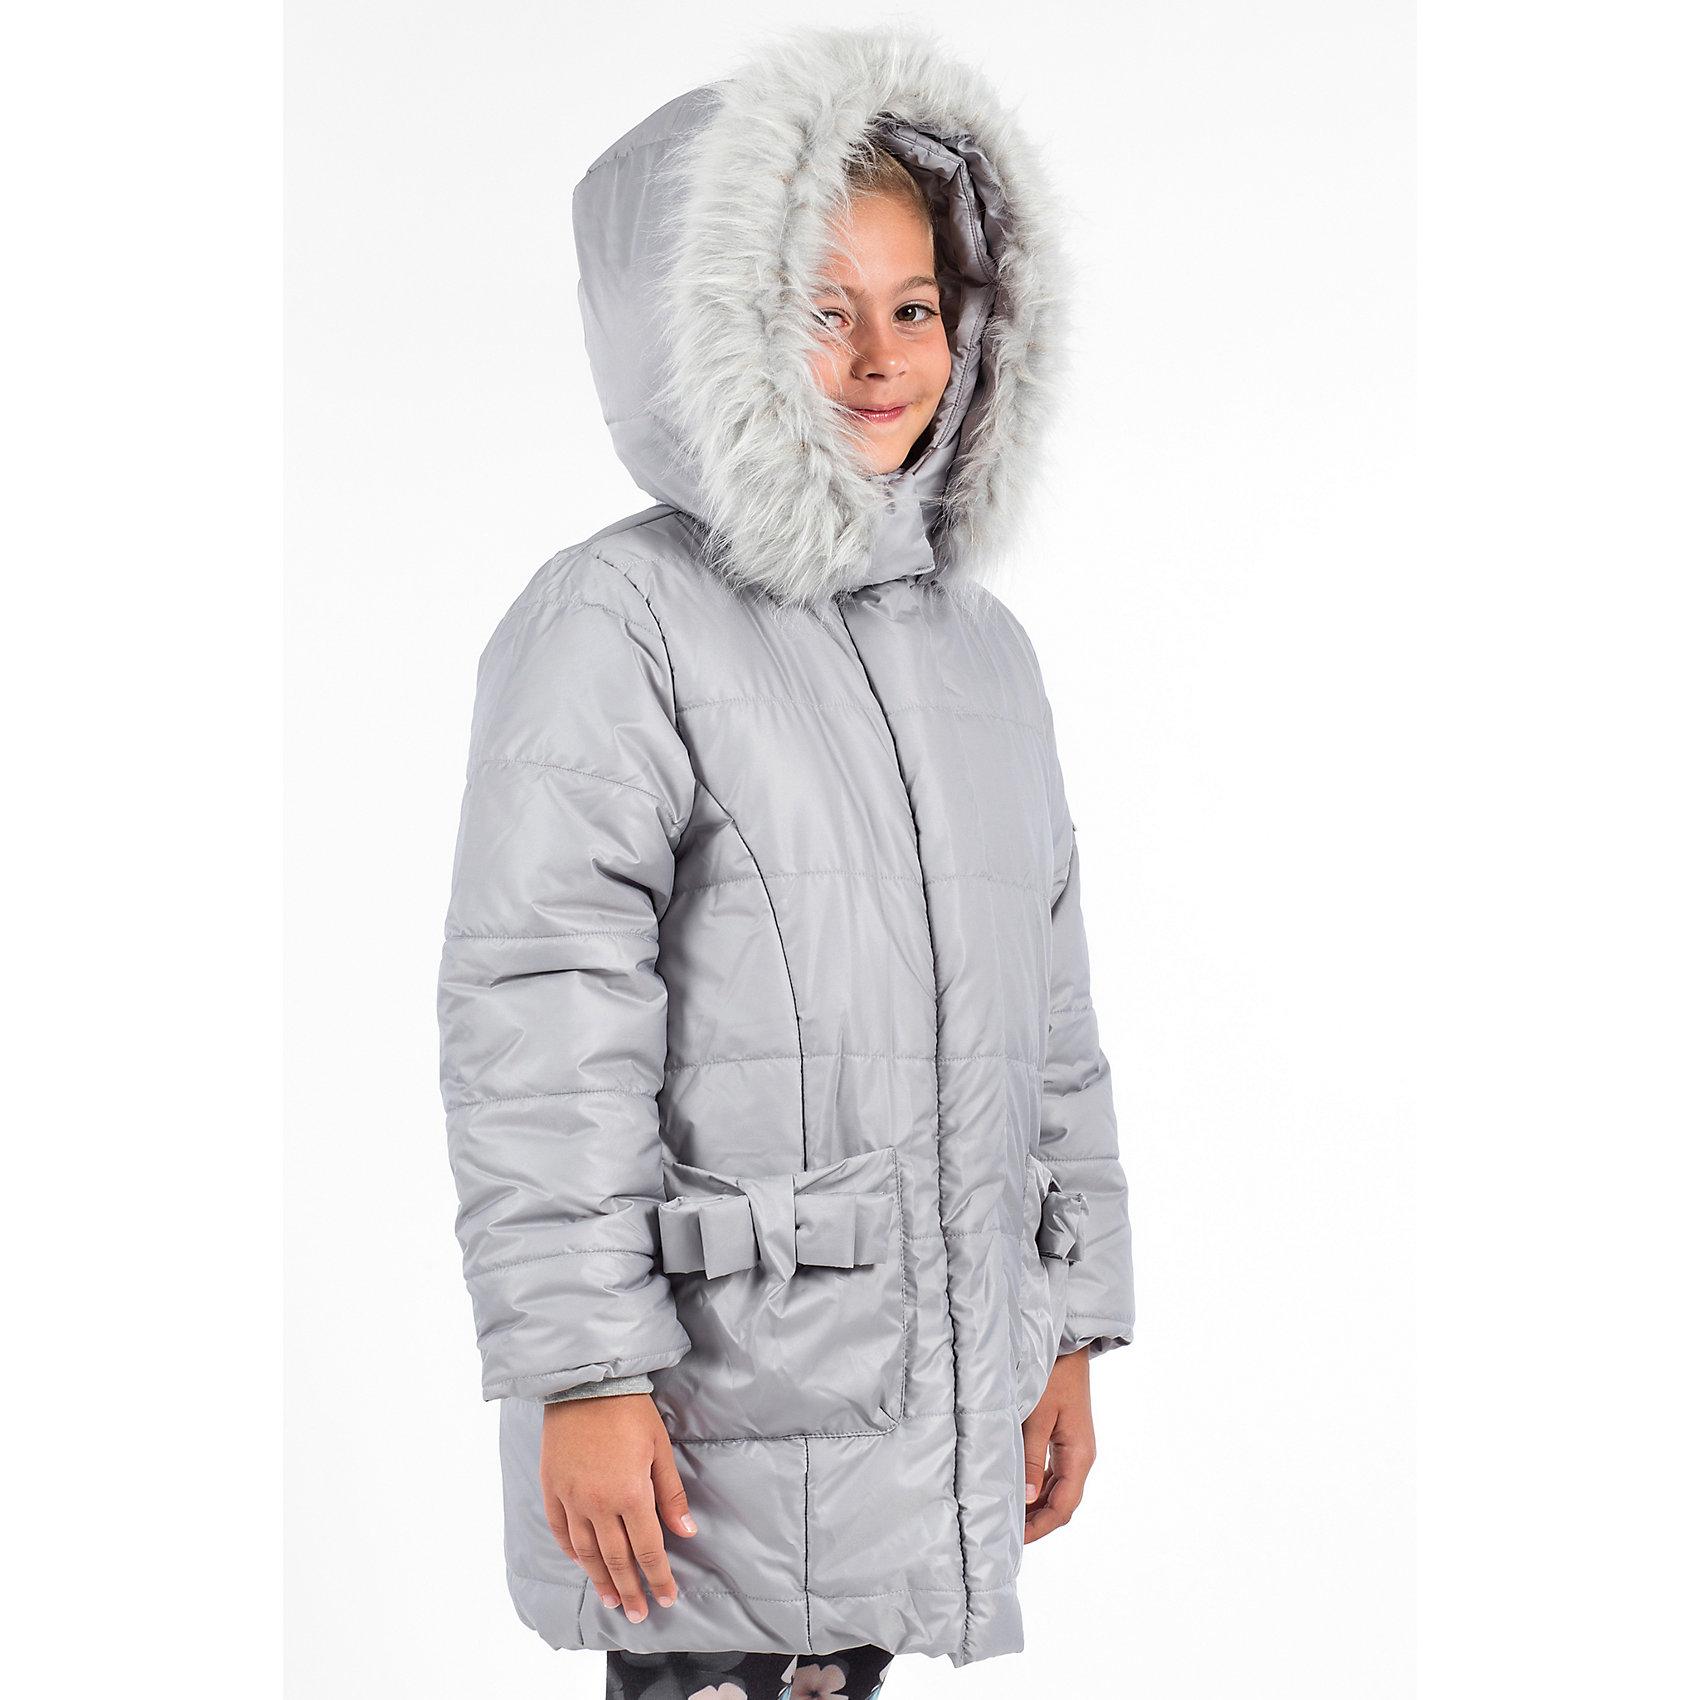 Куртка утепленная для девочки WojcikВерхняя одежда<br>Куртка утепленная для девочки Wojcik<br>Состав:<br>Полиэстер 100%<br><br>Ширина мм: 356<br>Глубина мм: 10<br>Высота мм: 245<br>Вес г: 519<br>Цвет: серый<br>Возраст от месяцев: 108<br>Возраст до месяцев: 120<br>Пол: Женский<br>Возраст: Детский<br>Размер: 140,146,104,110,116,122,128<br>SKU: 5591239